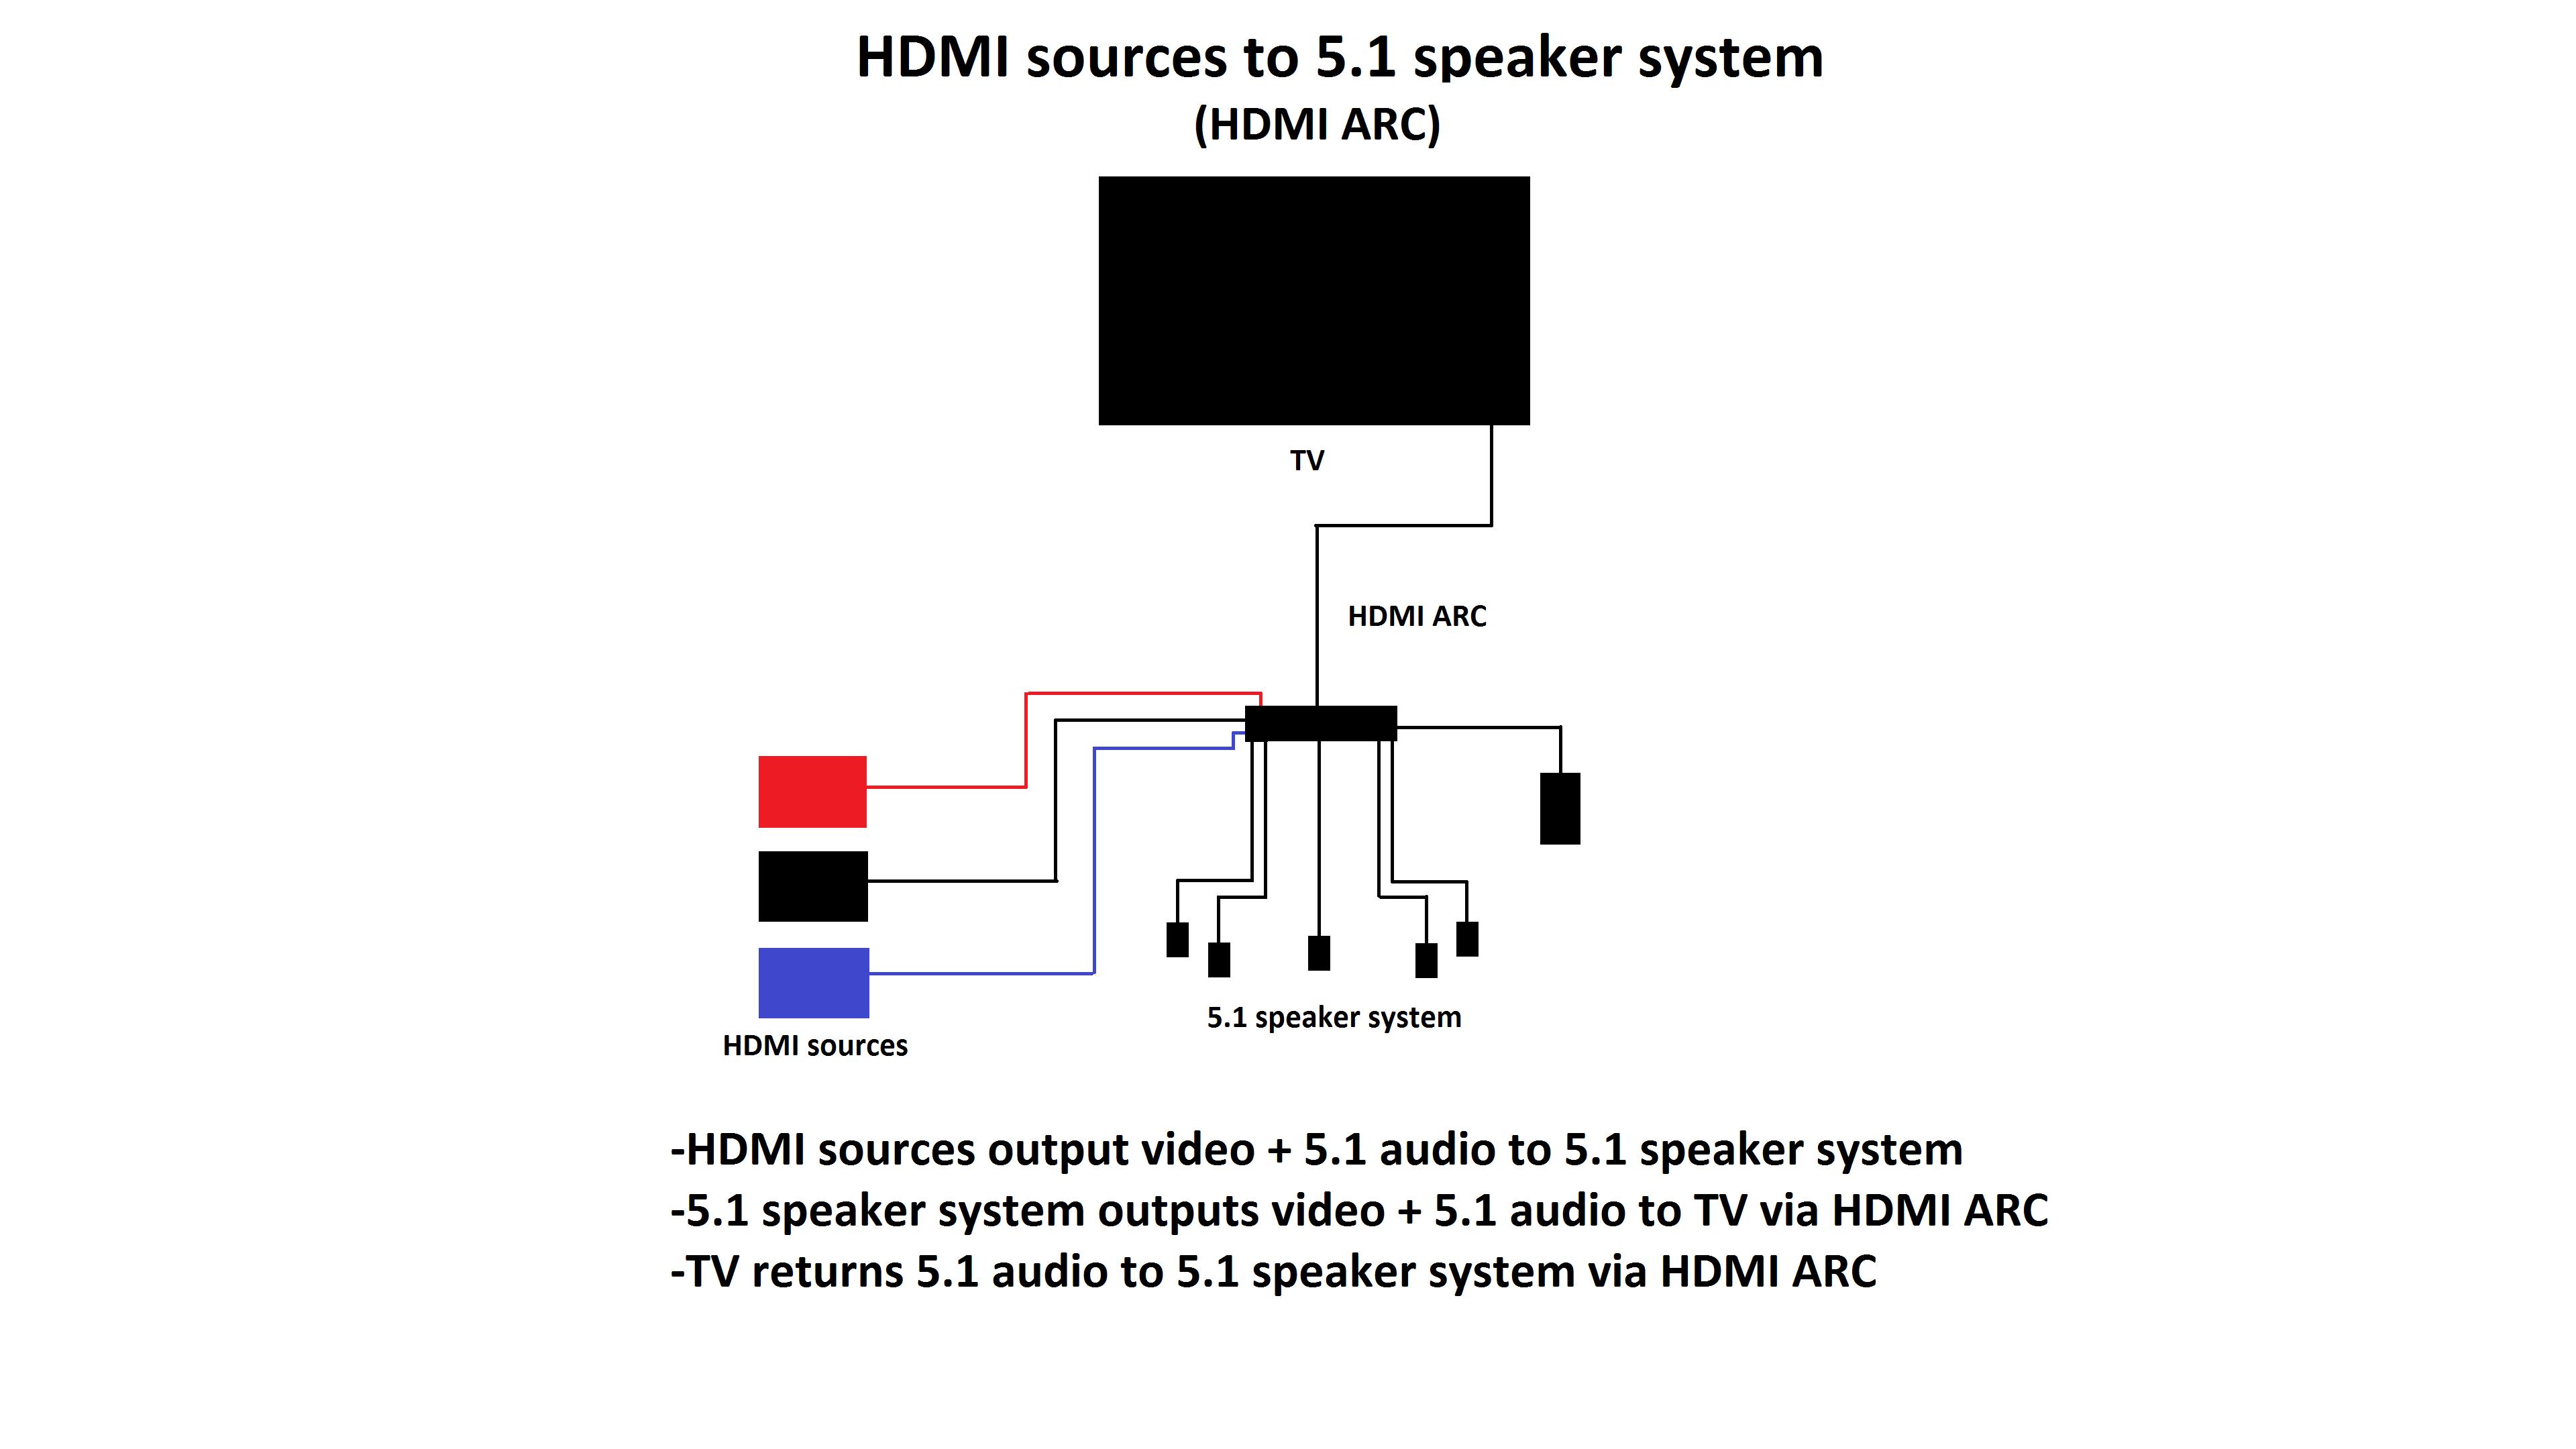 setups that take advantage of a TV's 5.1 audio output and